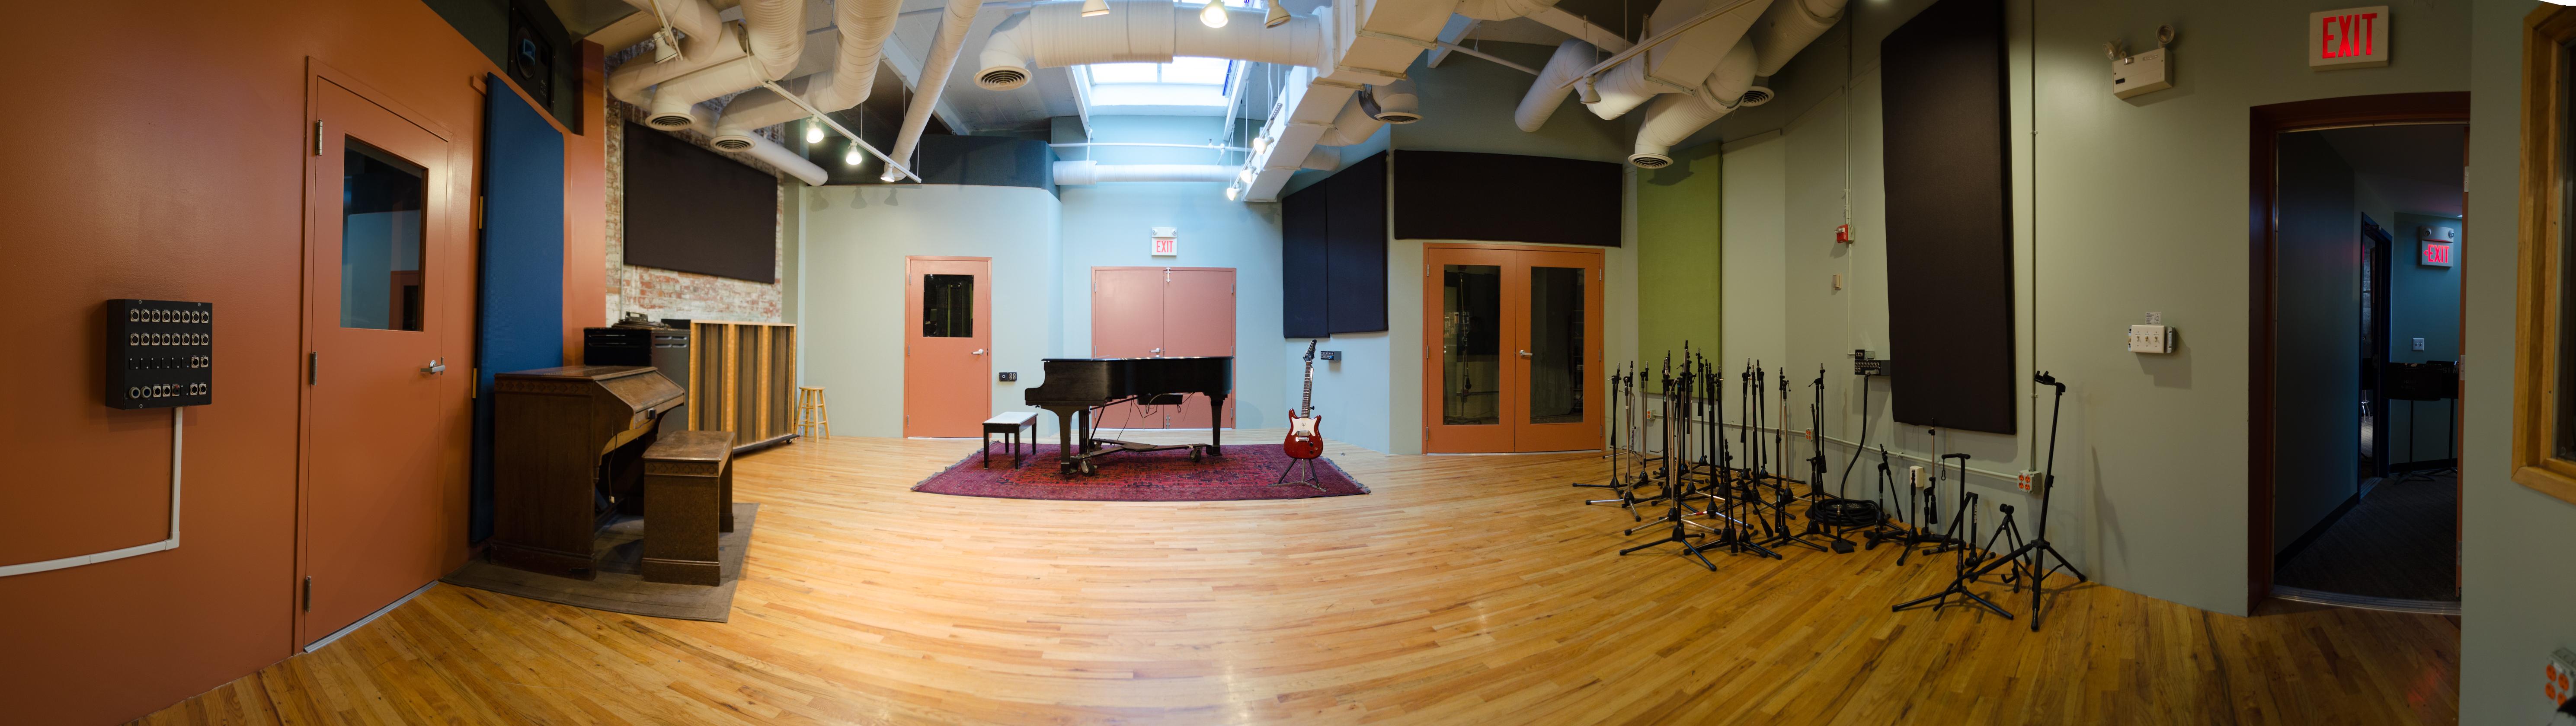 Live room foto 14